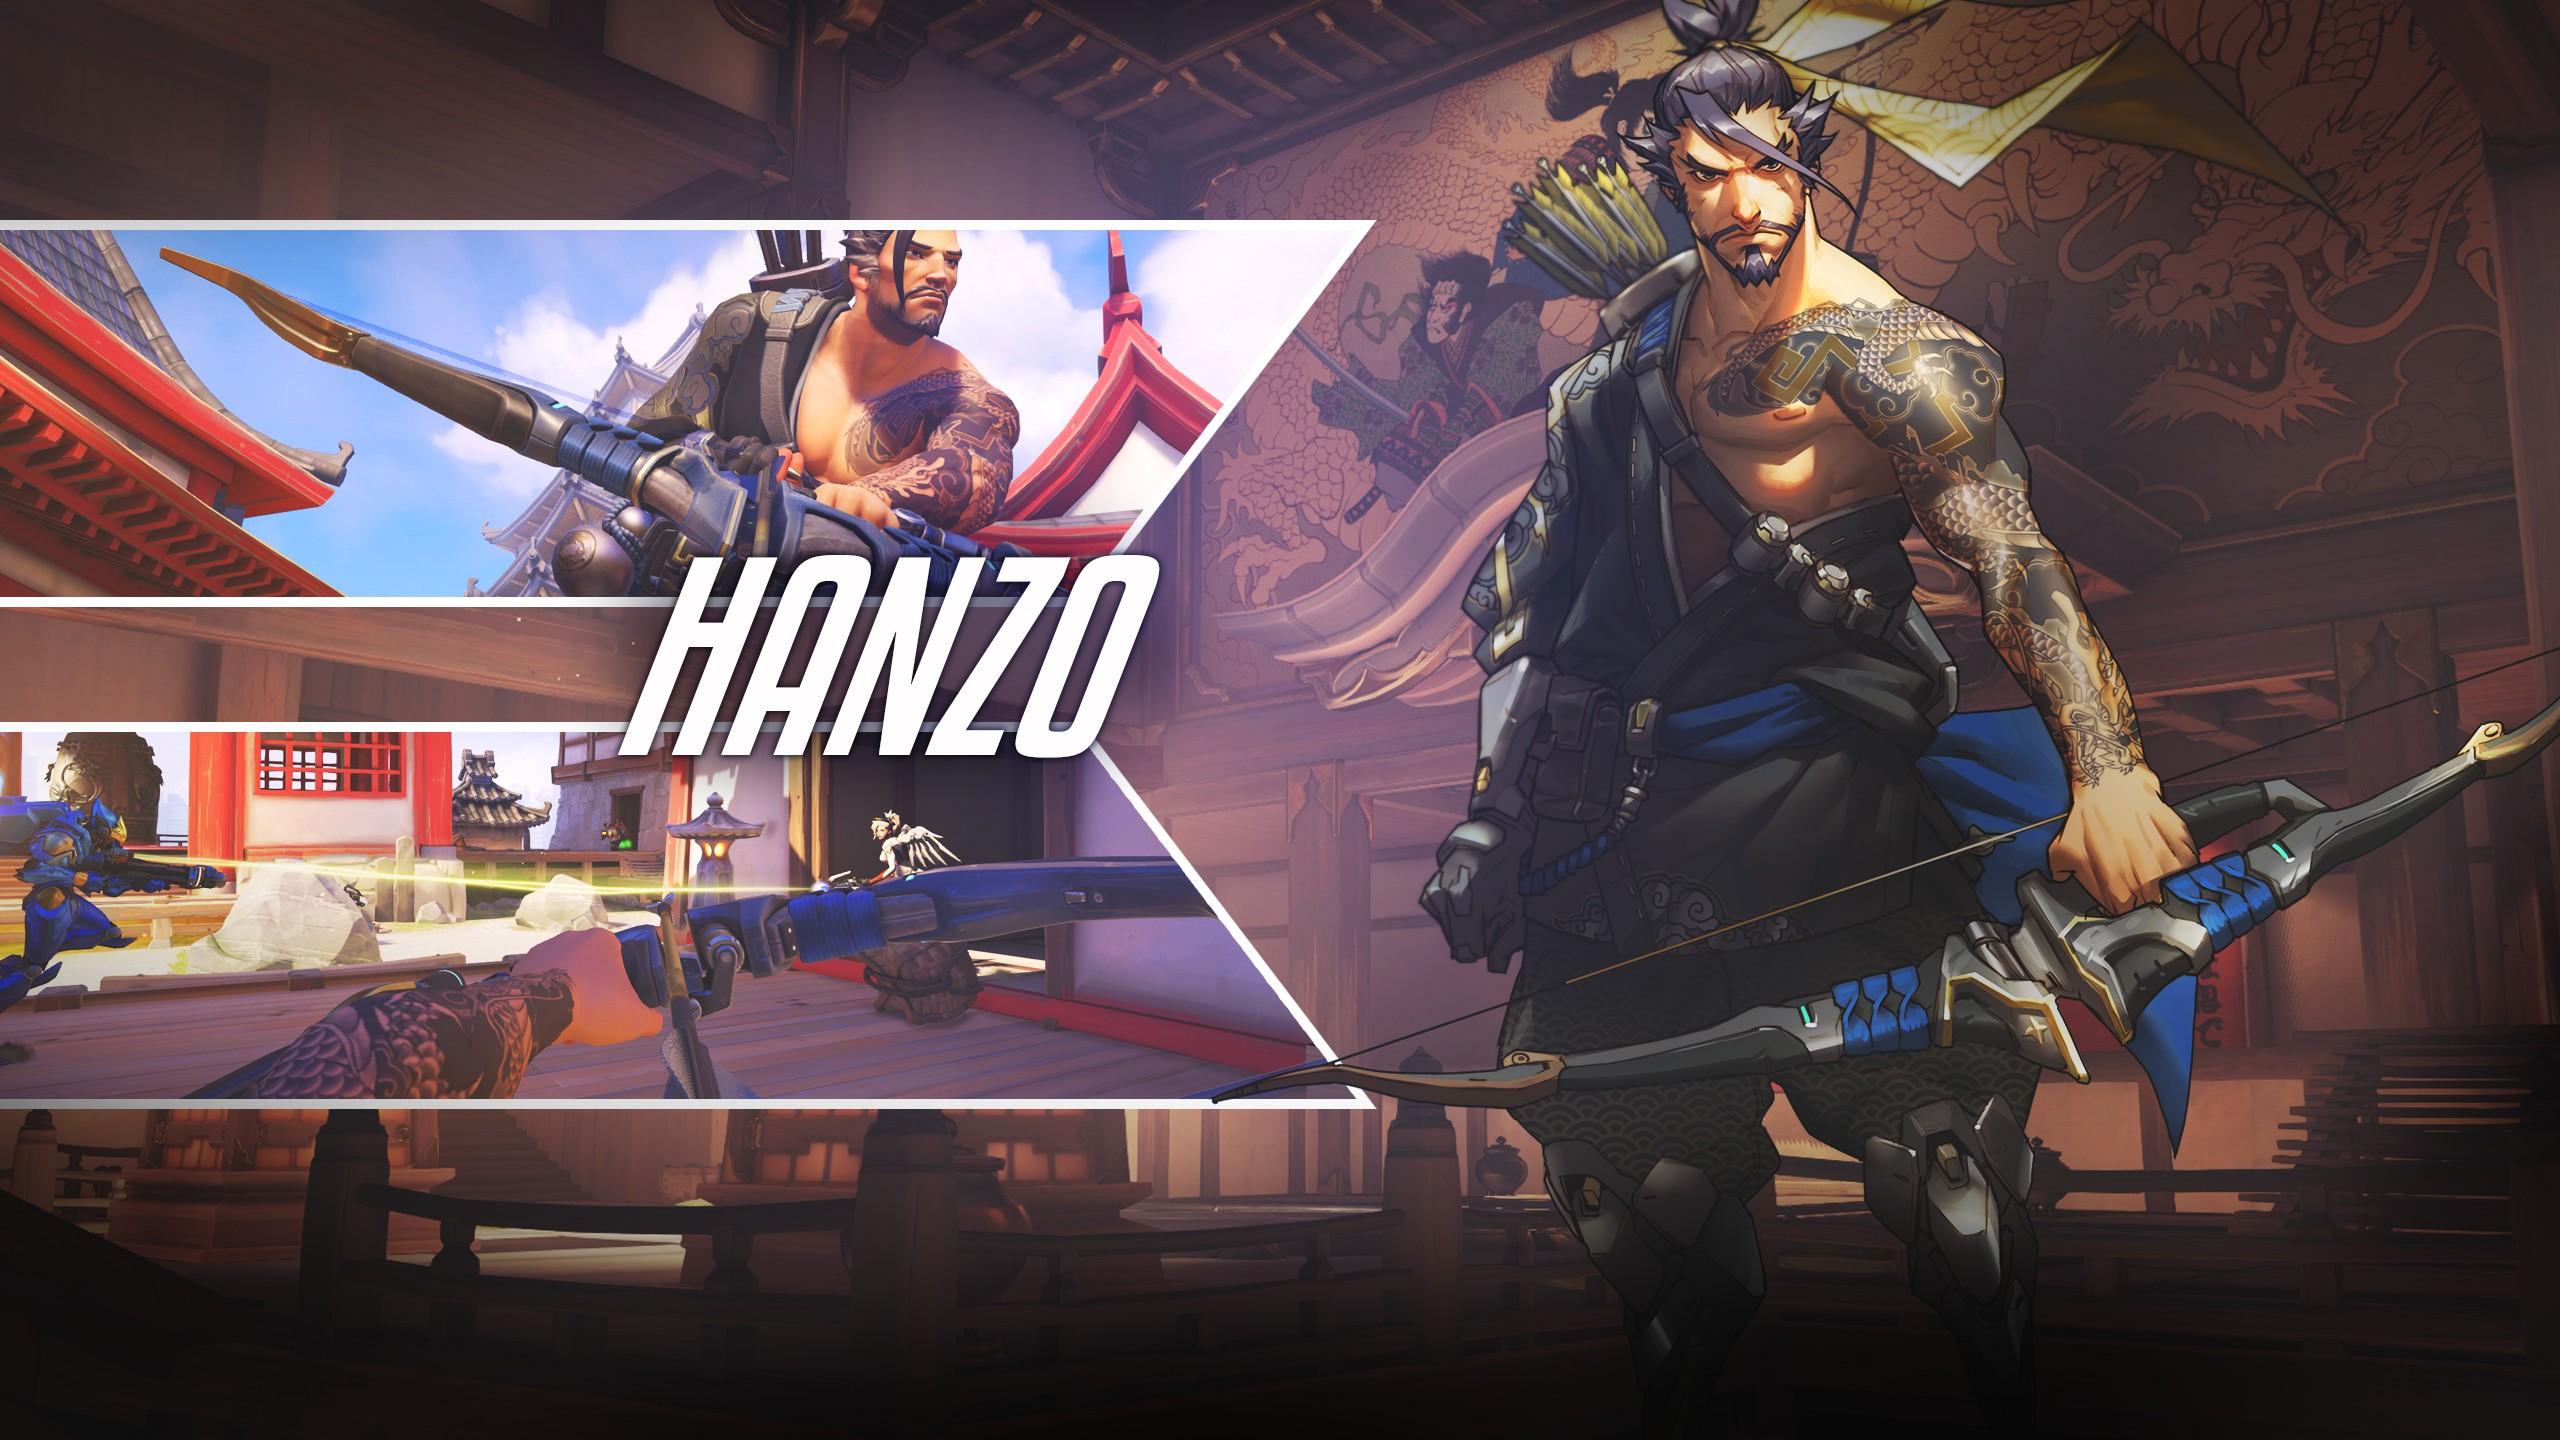 2048x2048 Widowmaker Overwatch Art Ipad Air Hd 4k: Overwatch Hanzo Wallpaper ·① Download Free Amazing